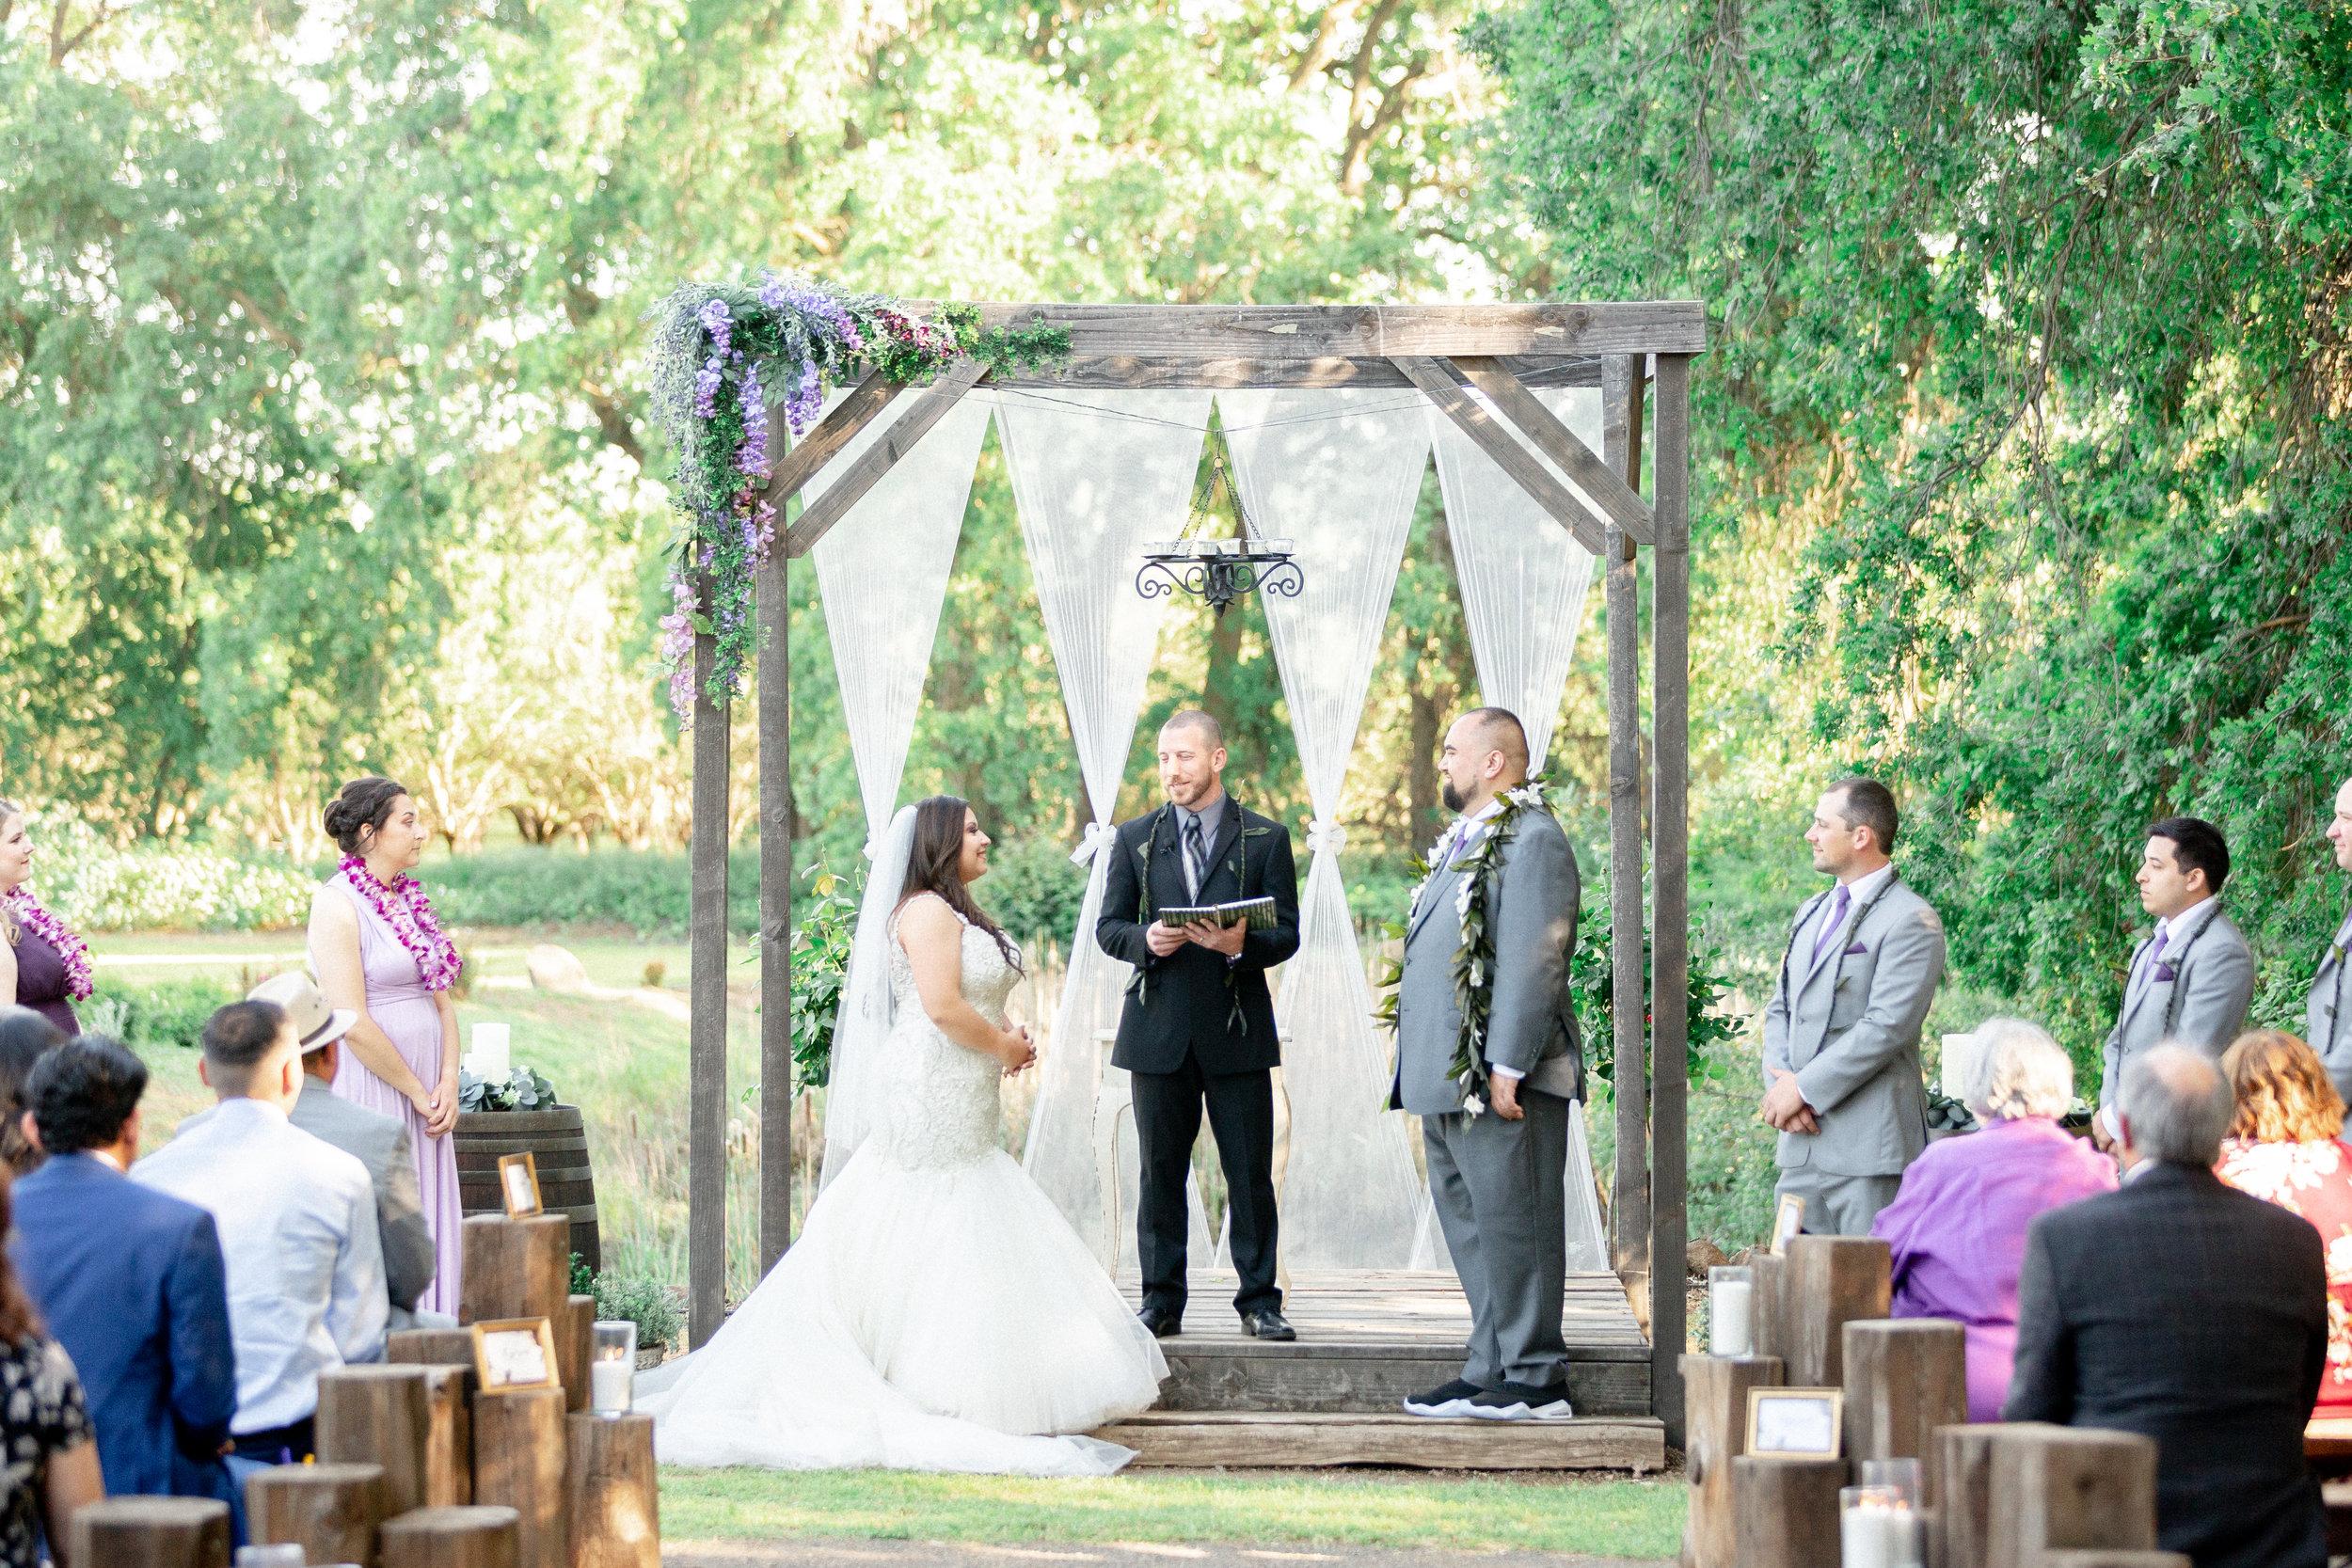 wedding-ceremony-at-bella-rosa-farms-in-northern-california.jpg